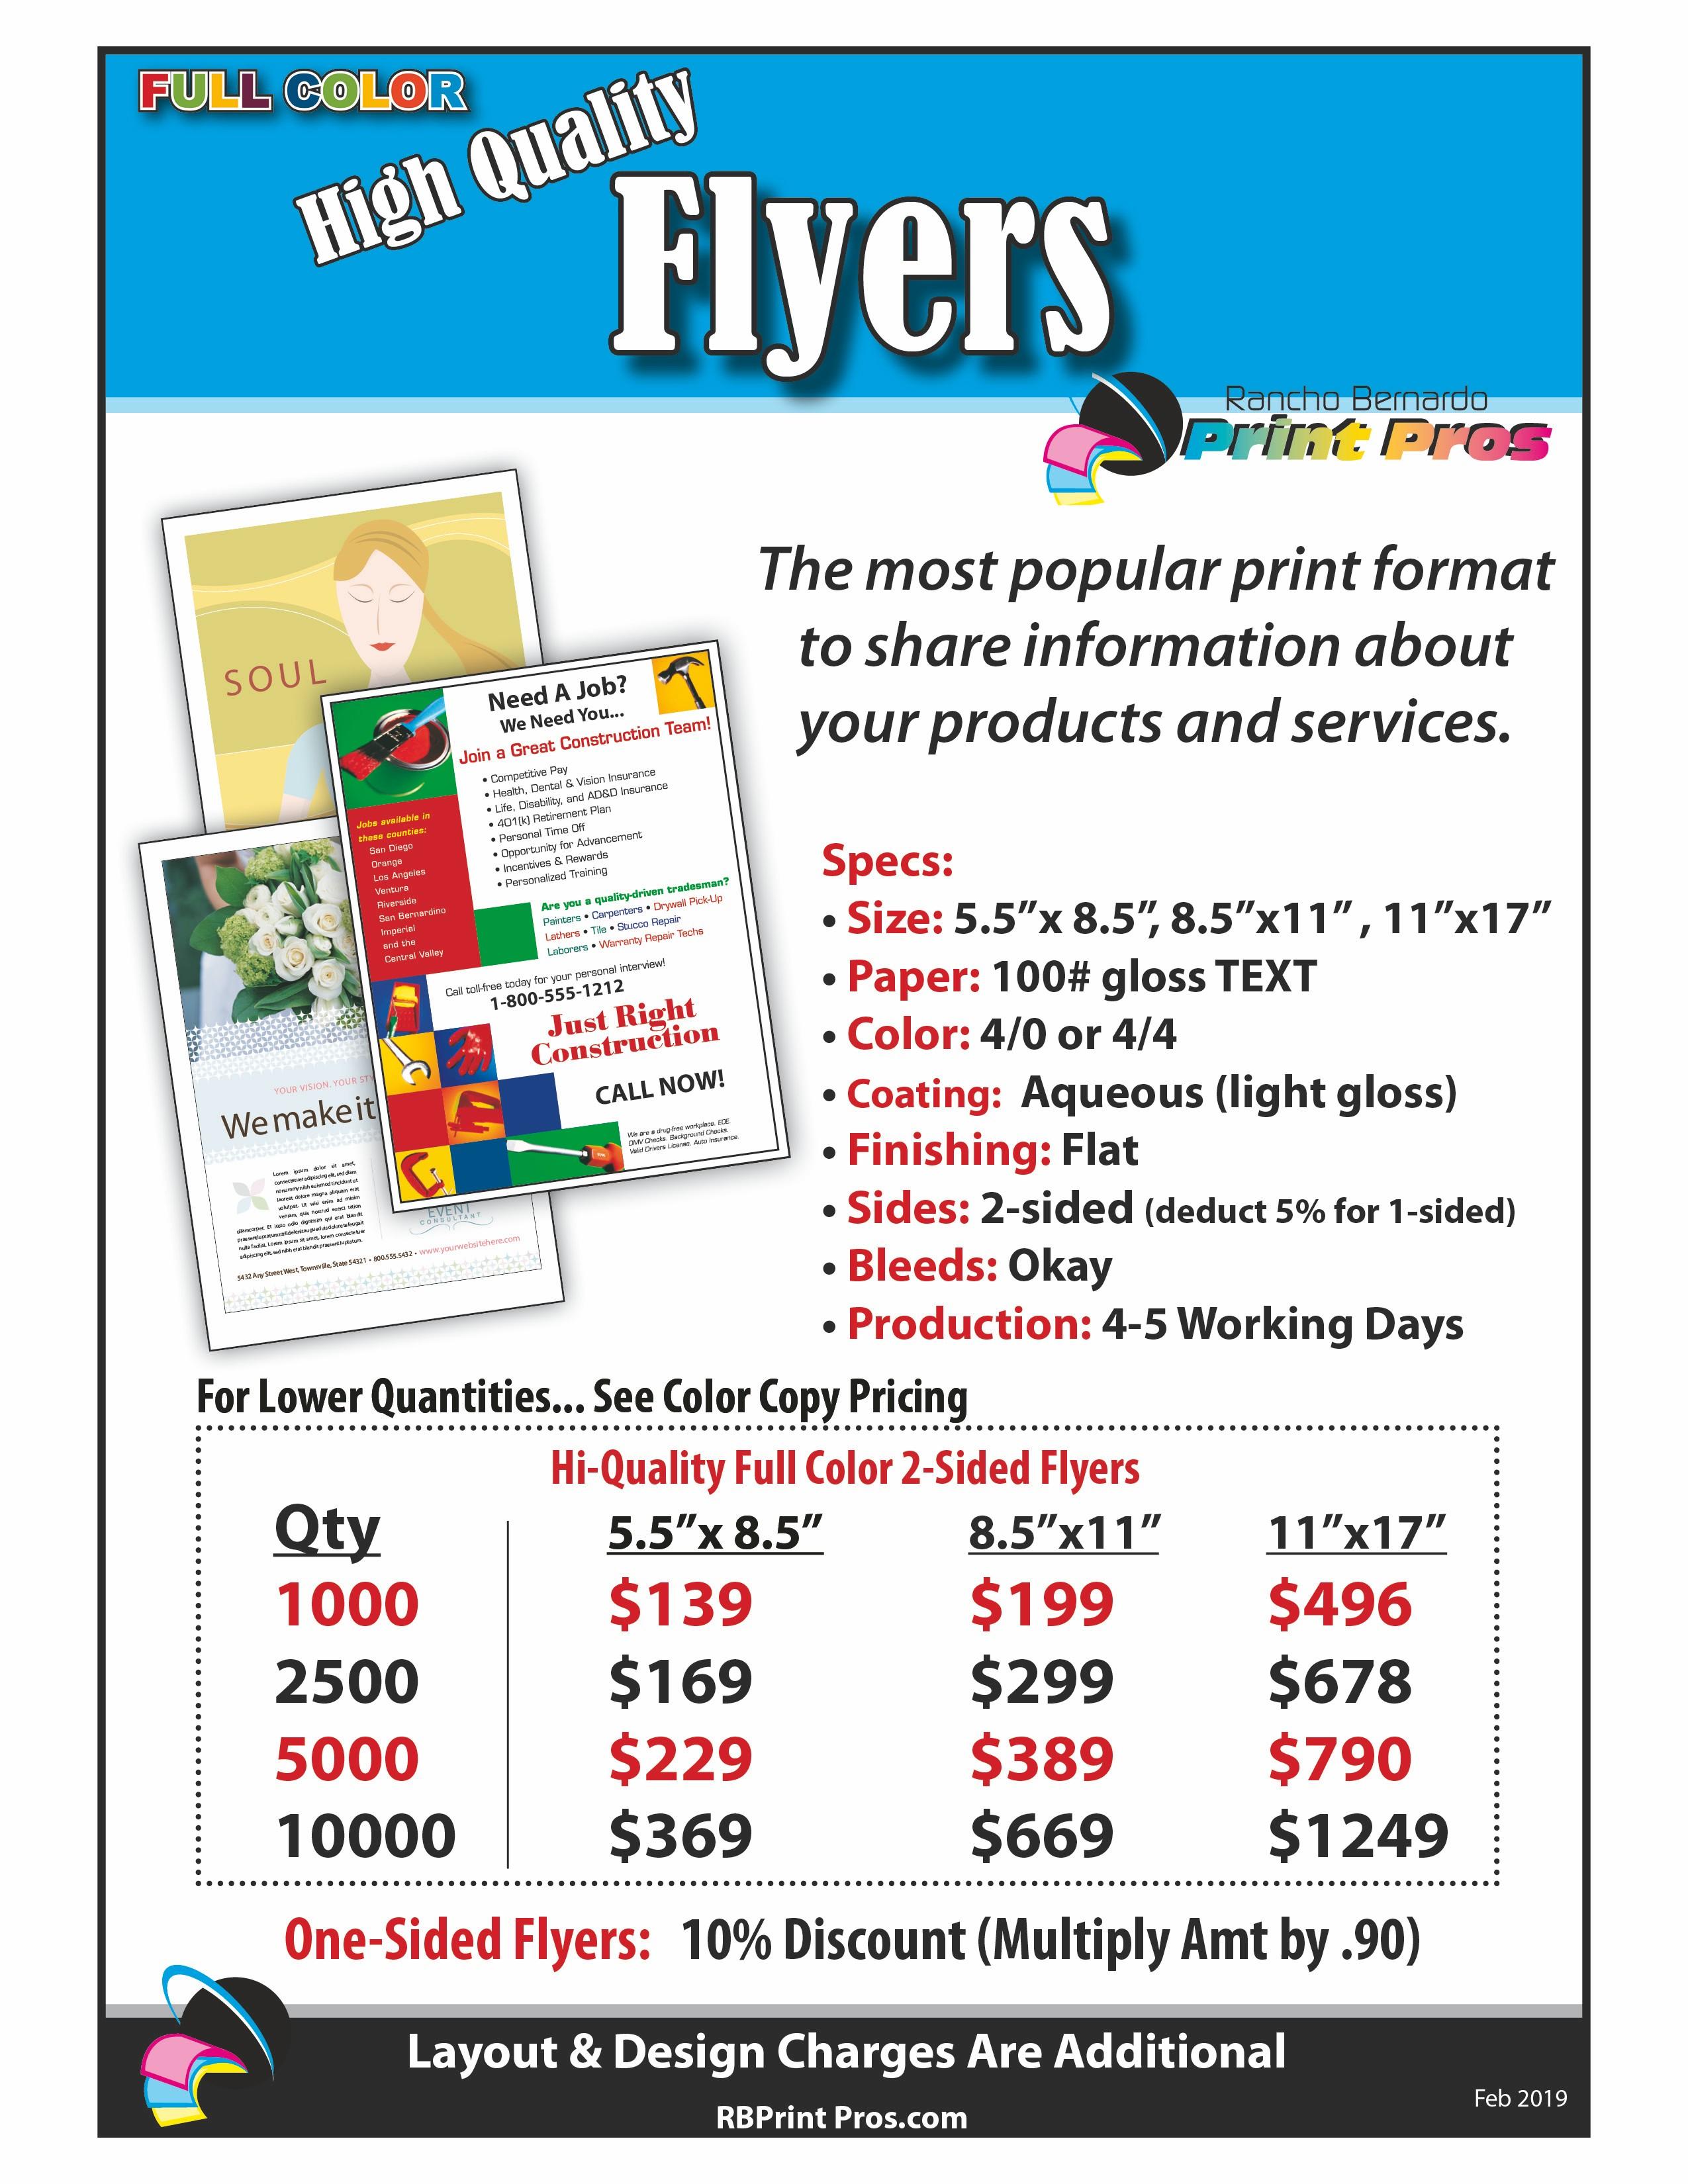 rbpp_4c.flyers.3.6.19.hi300.jpg